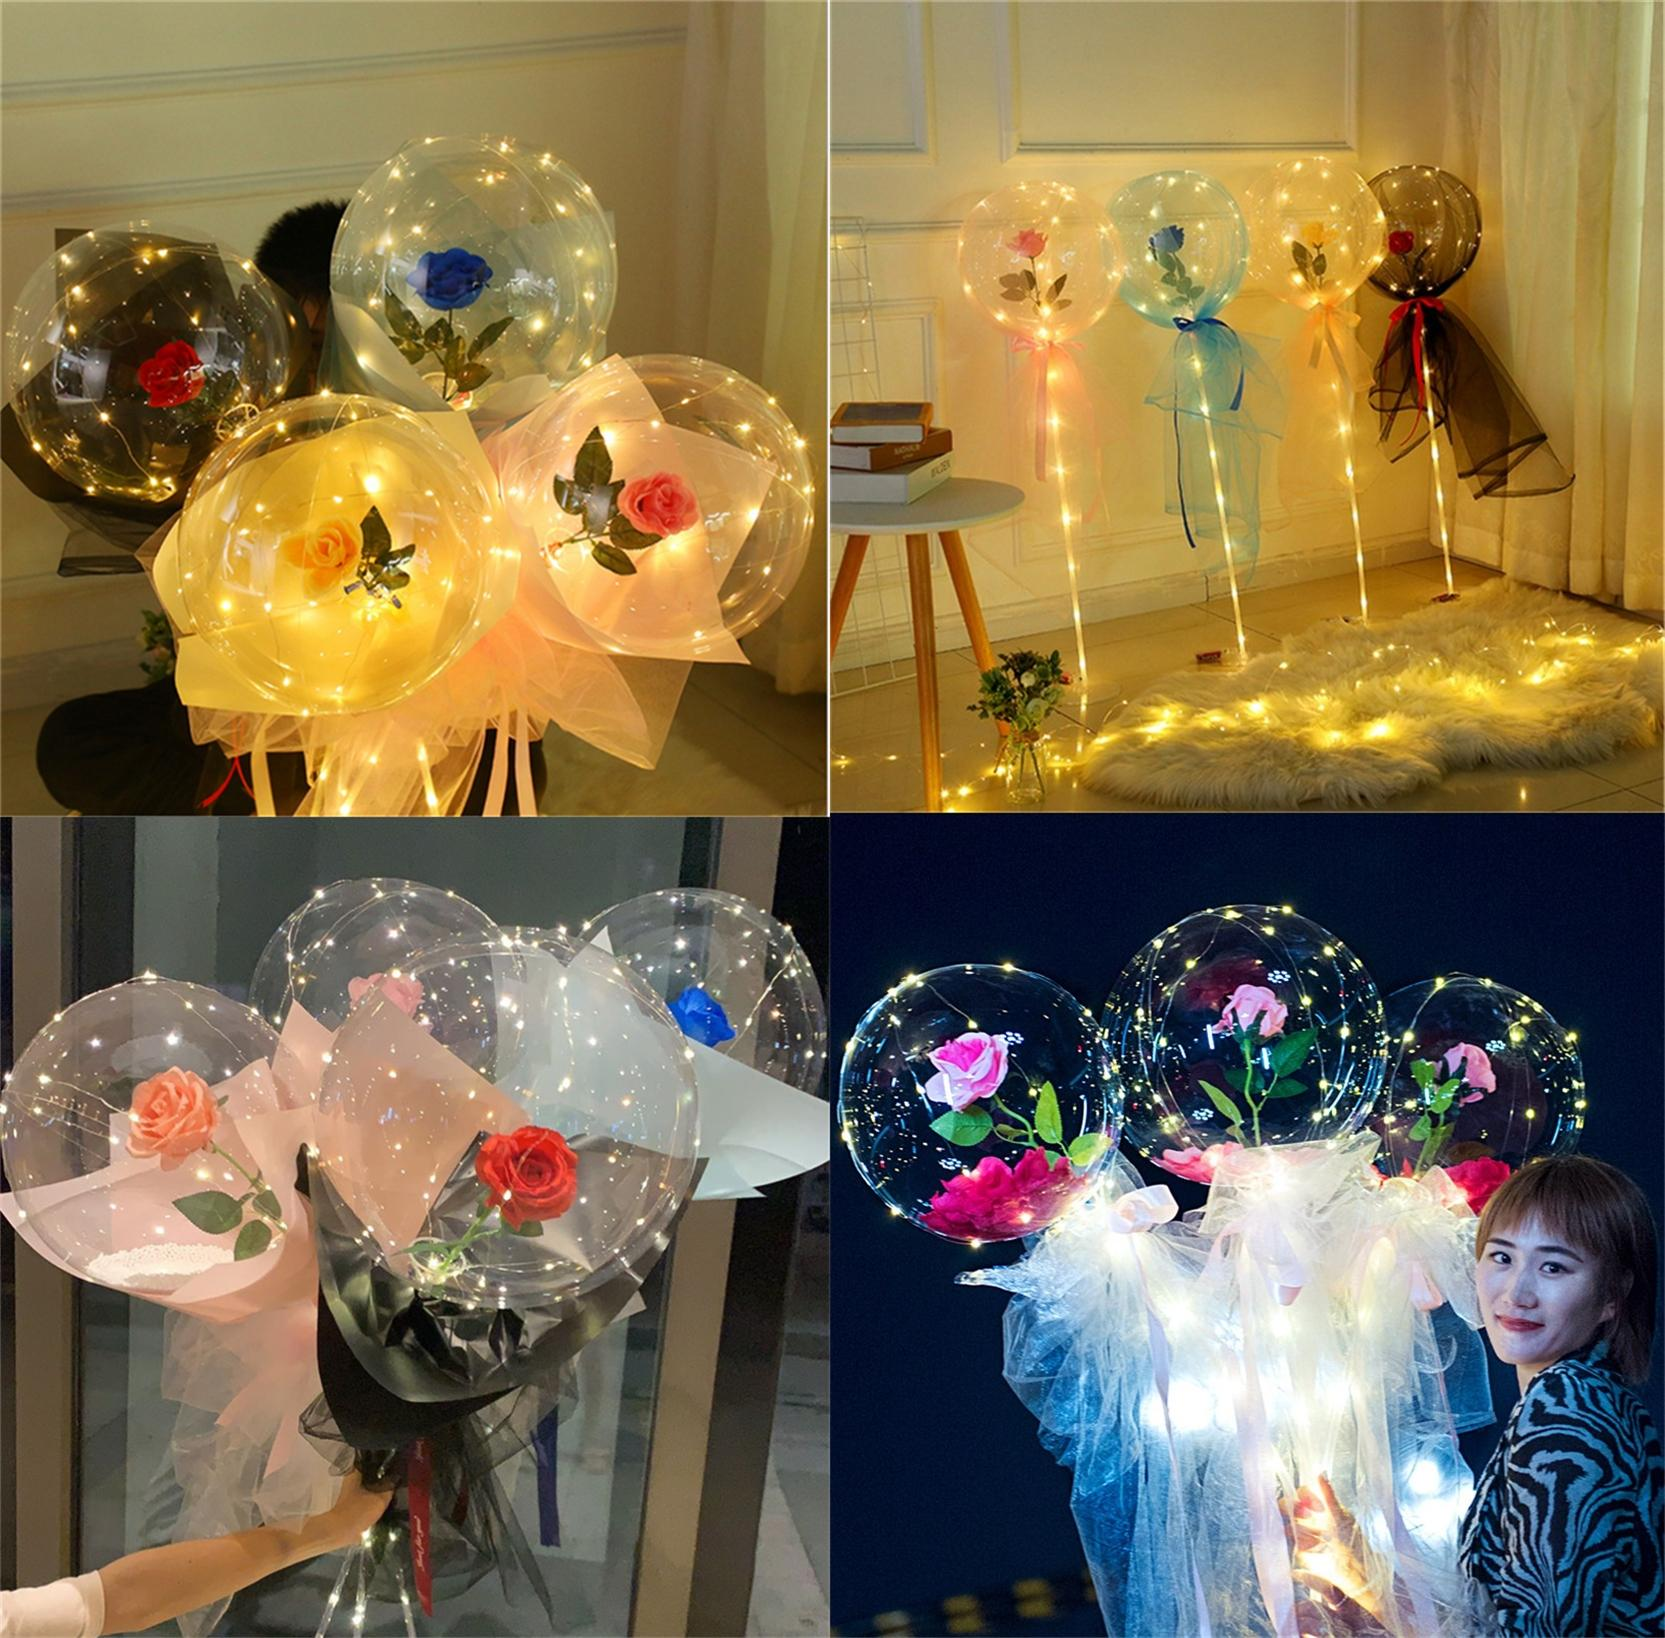 LED leuchtender Ballon Rose Bouquet Transparent Bobo Ball Rose Valentinstag Geschenk Geburtstags-Party Hochzeitsdekoration Ballons E121801